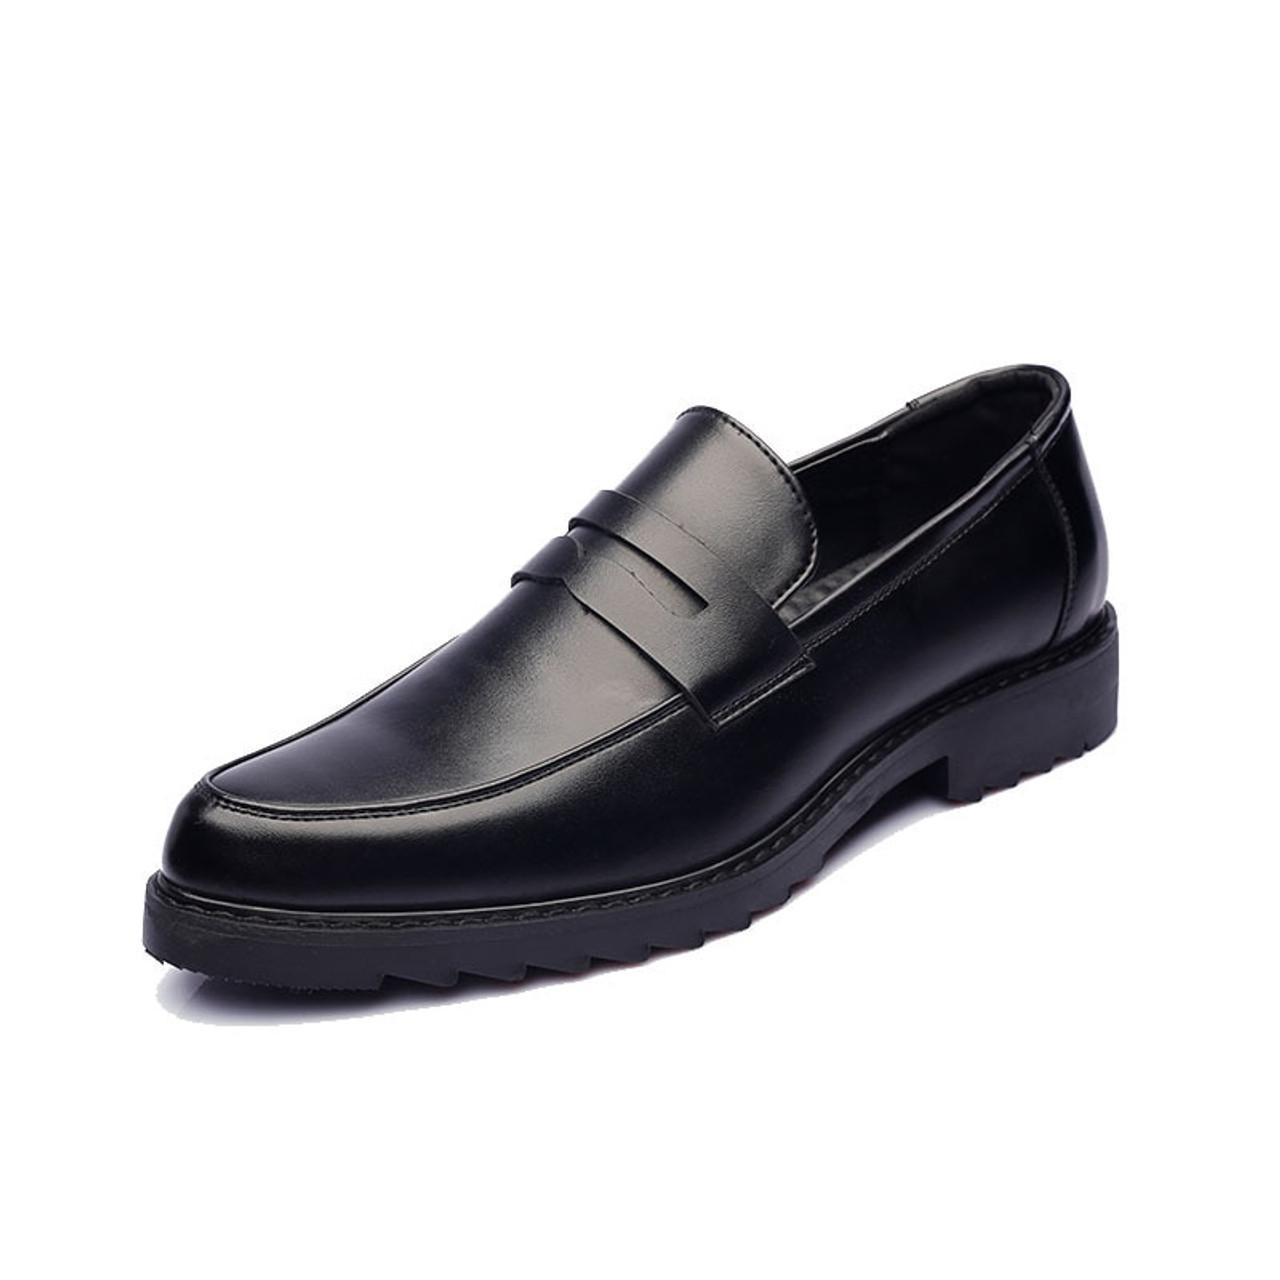 137c841d6ed3 ... office patent leather shoes men brand business platform shoes oxford shoes  for men formal wedding dress